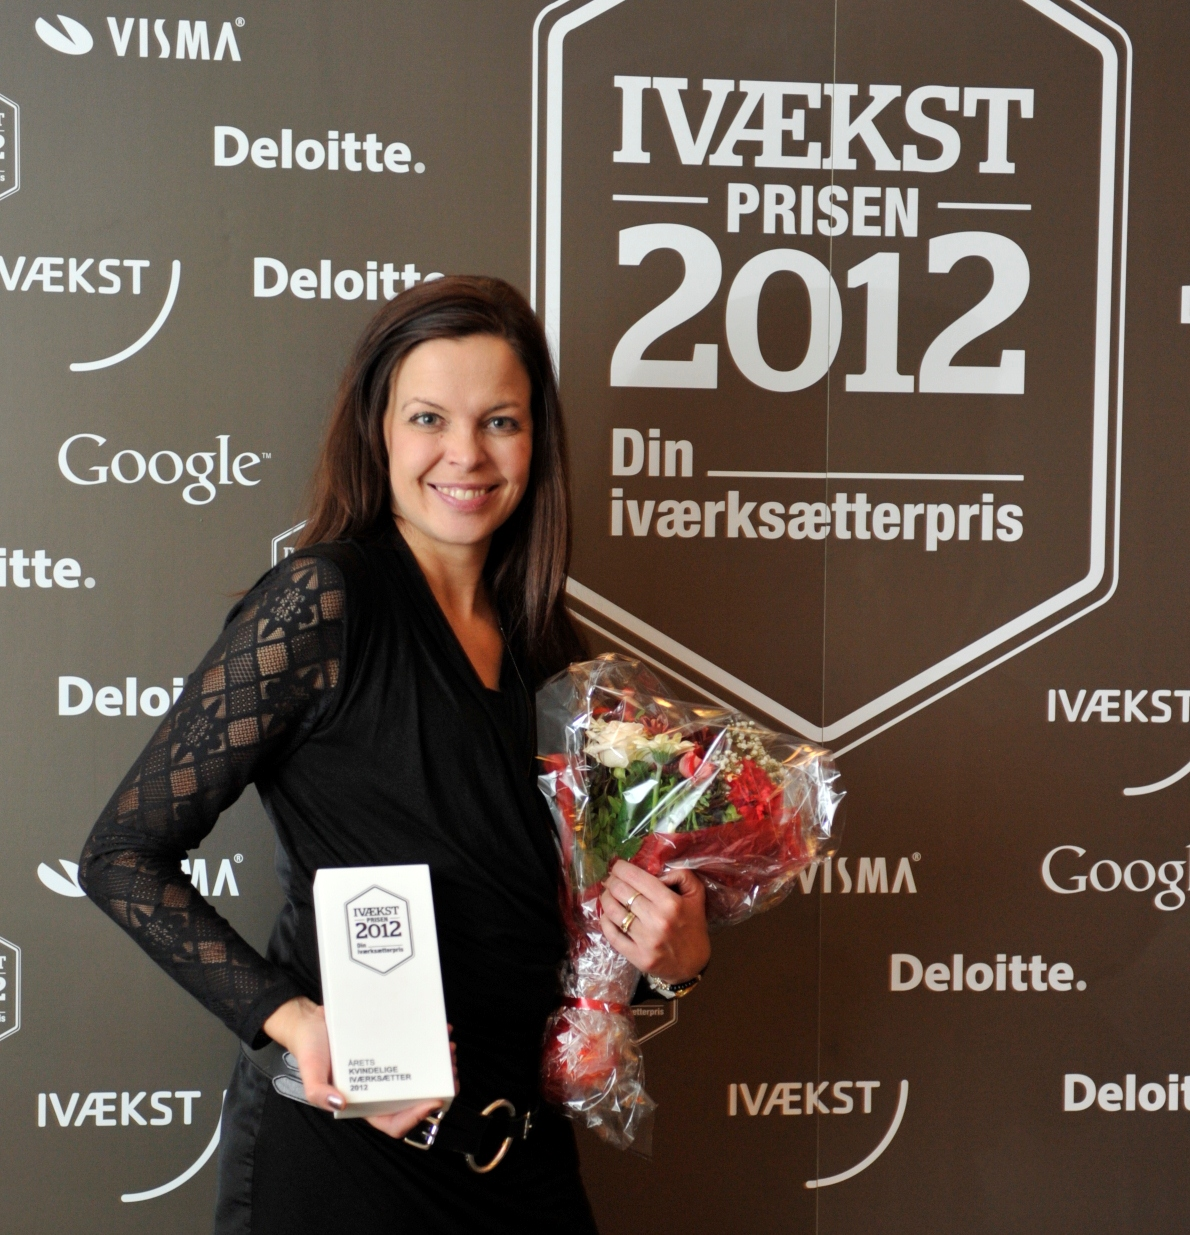 Camilla Ley Valentin fra Queue-It vinder Ivækstpris